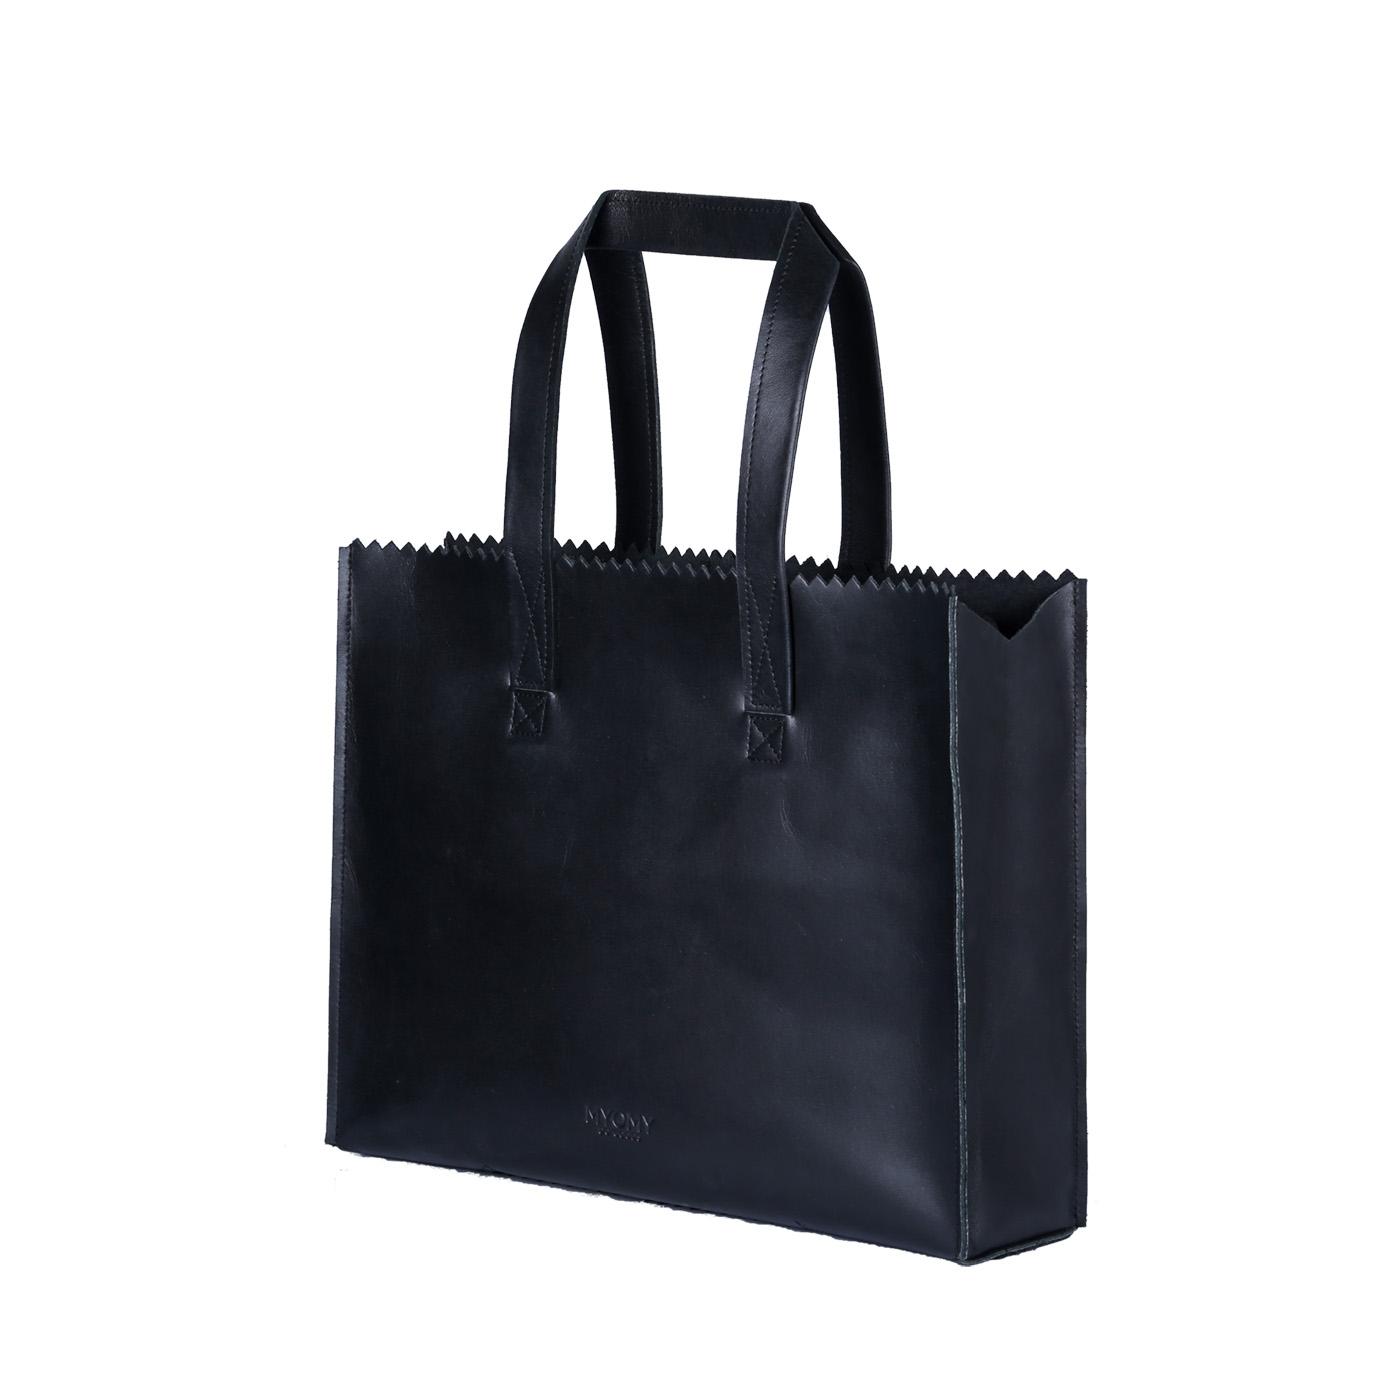 Work Waxy Paper Black Bag My Myomy Hunter It qEXnp